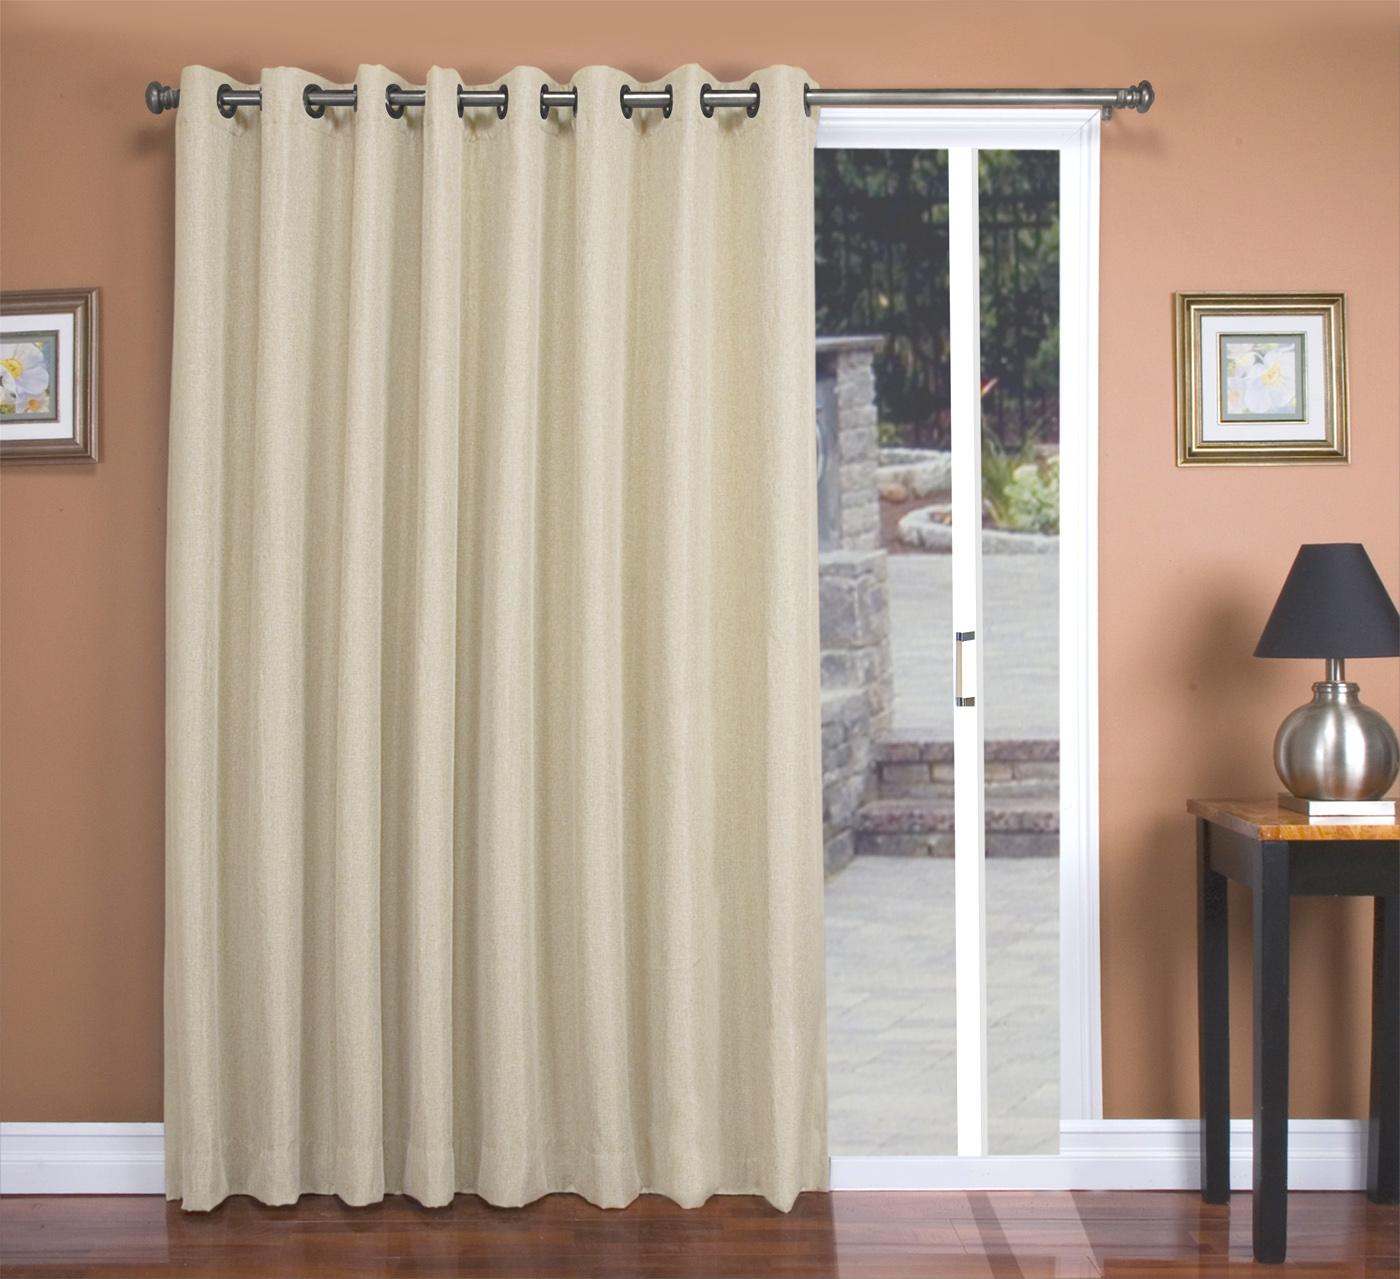 patio door curtains - thecurtainshop.com GPSYVJE